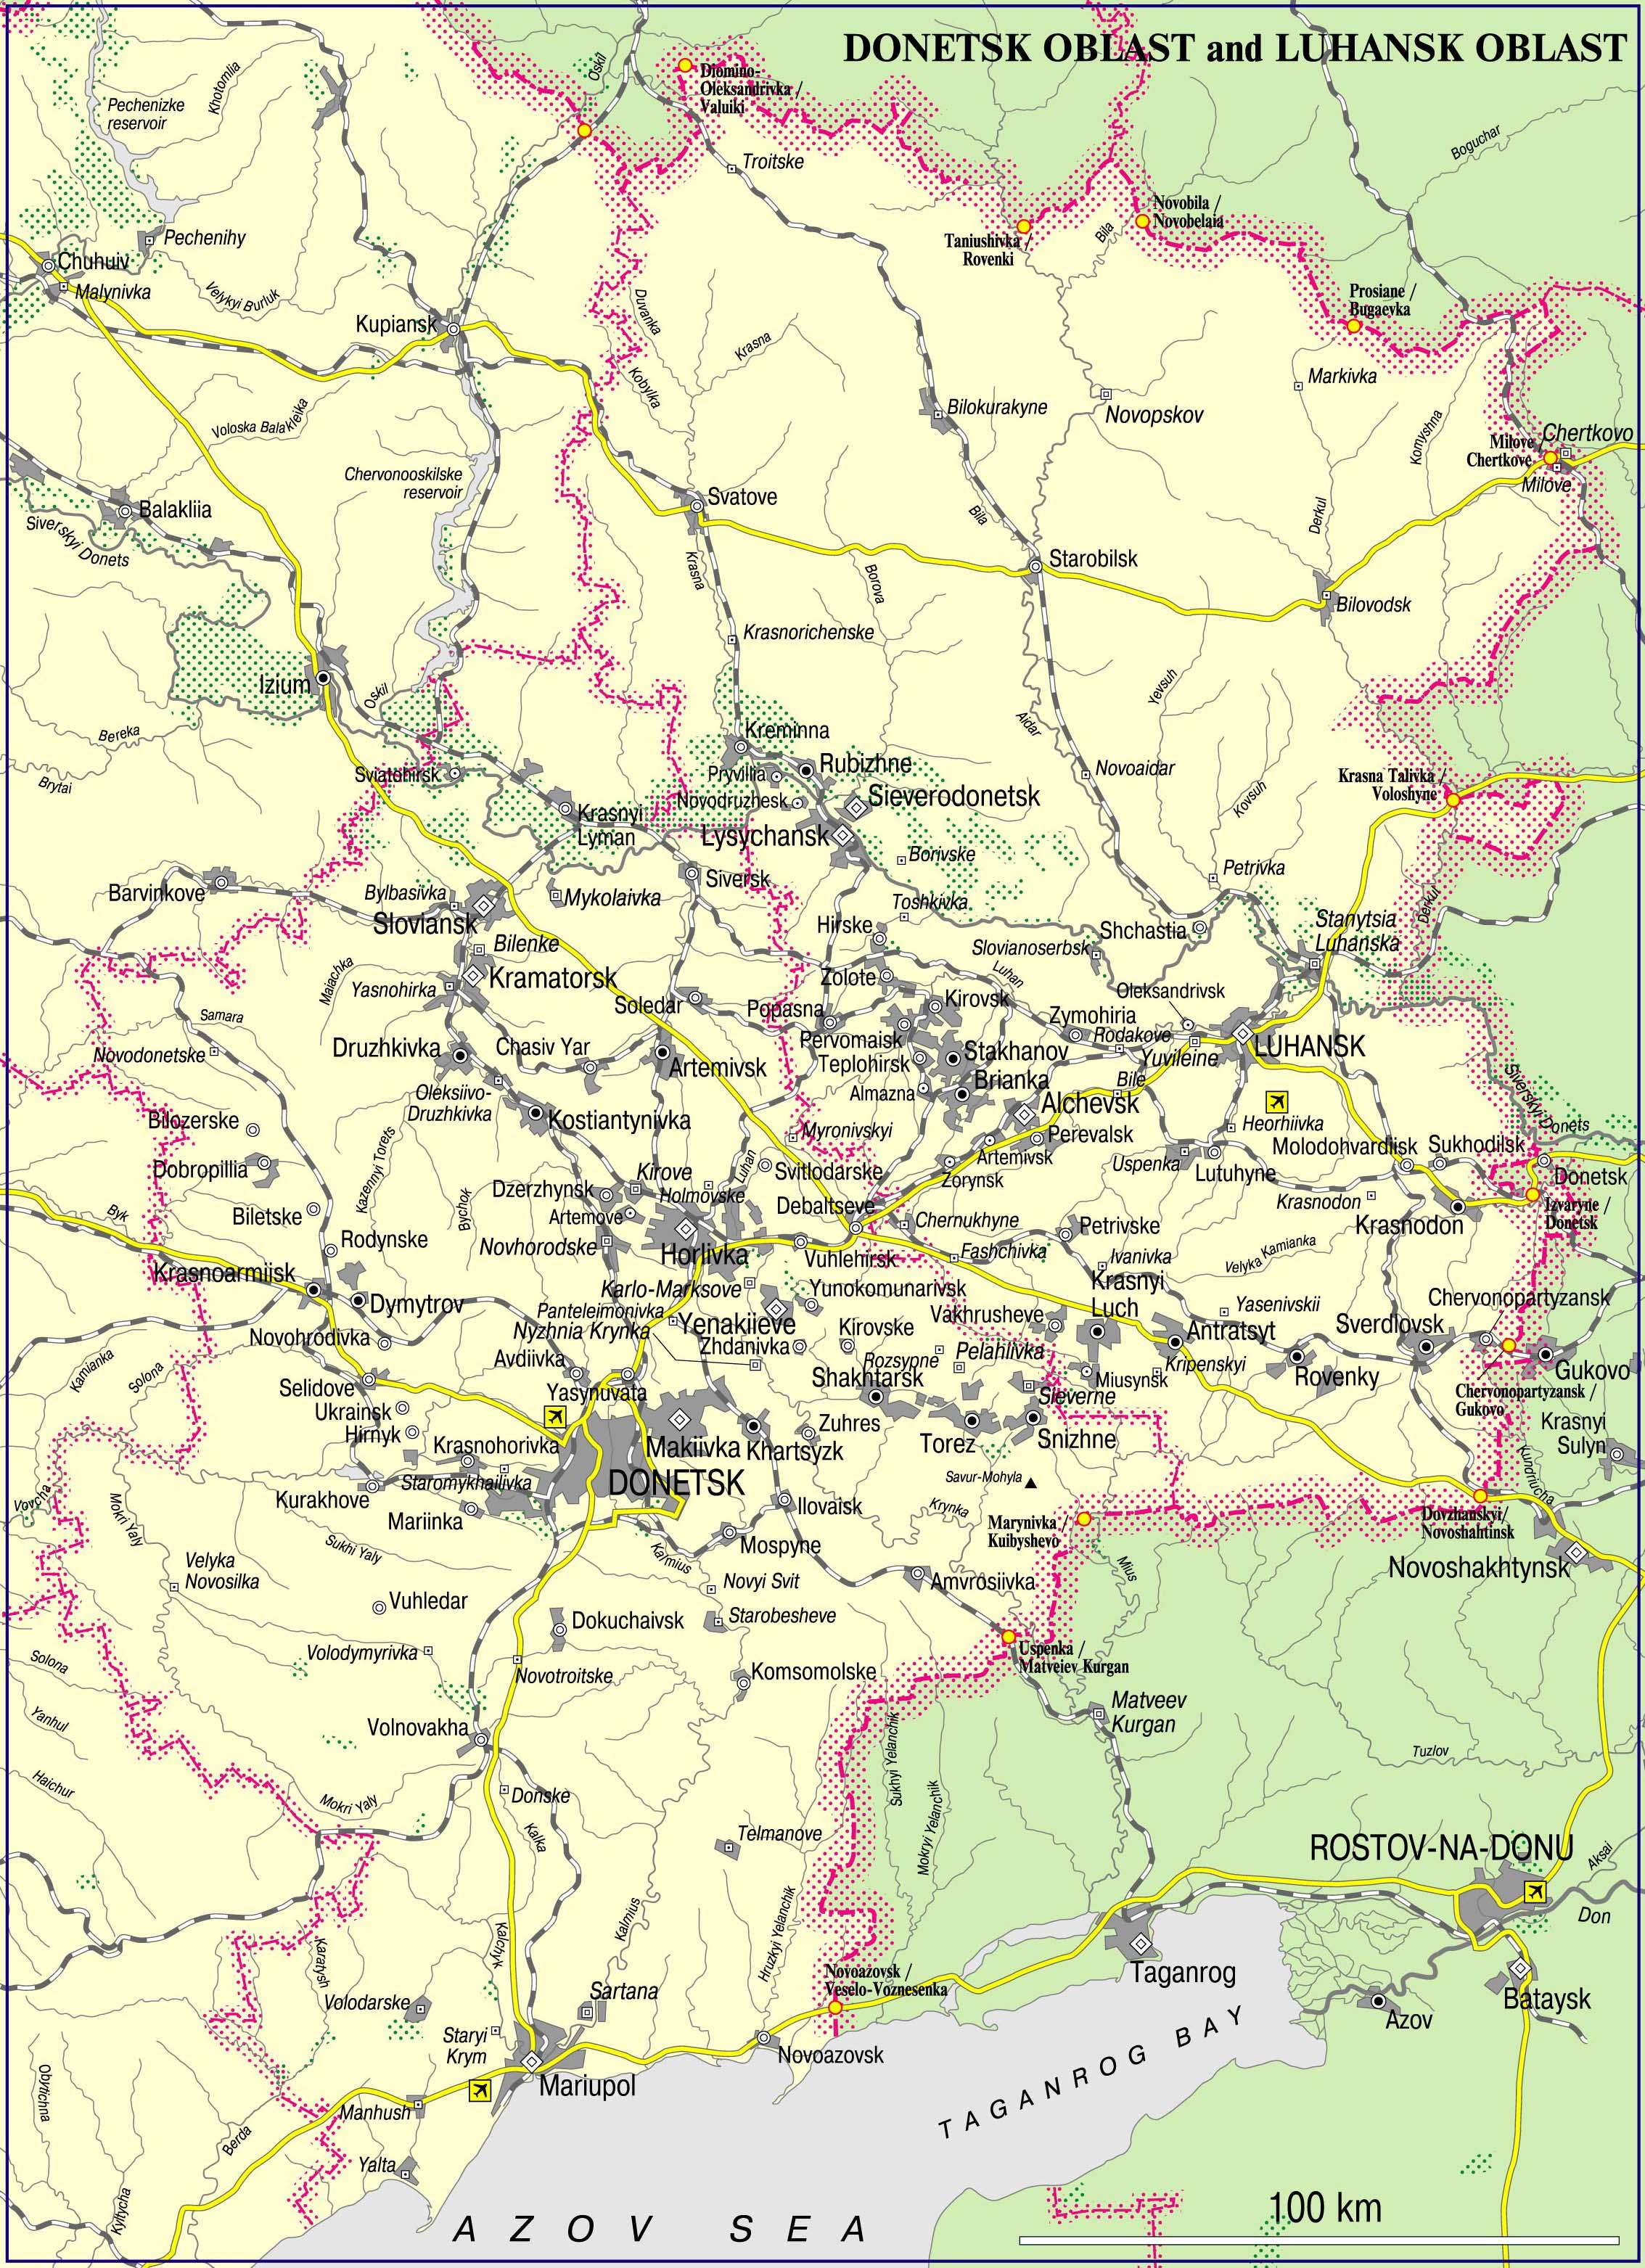 Ukraine: Situation Escalates in Donbass Region